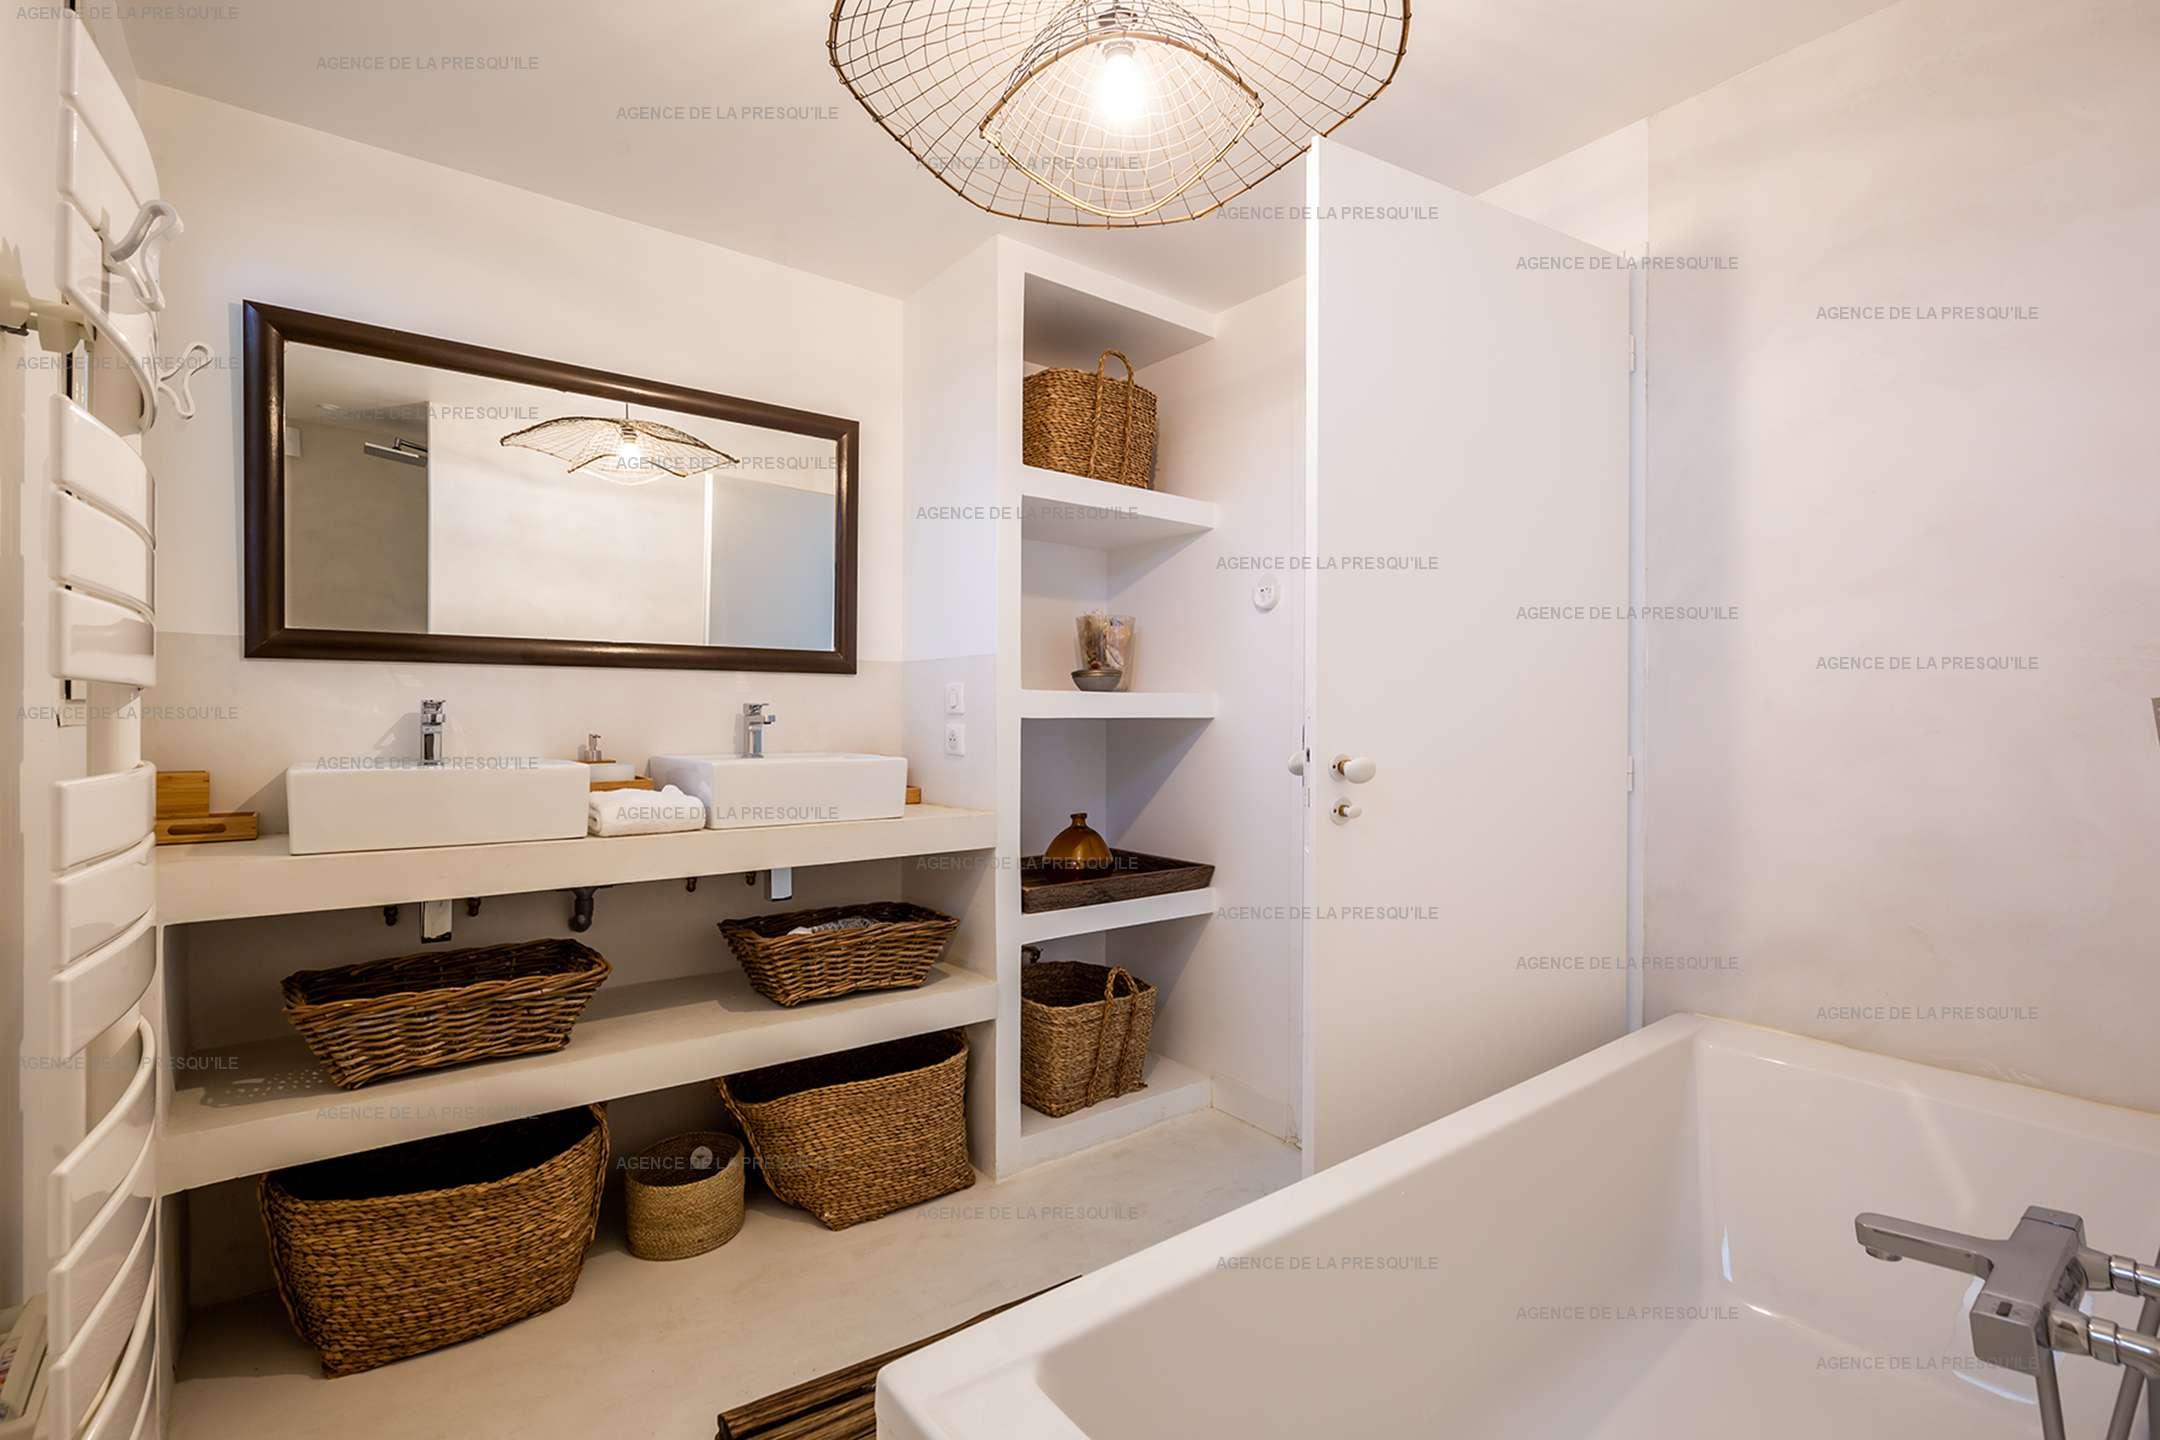 Location: Superbe villa avec vue bassin et piscine 12